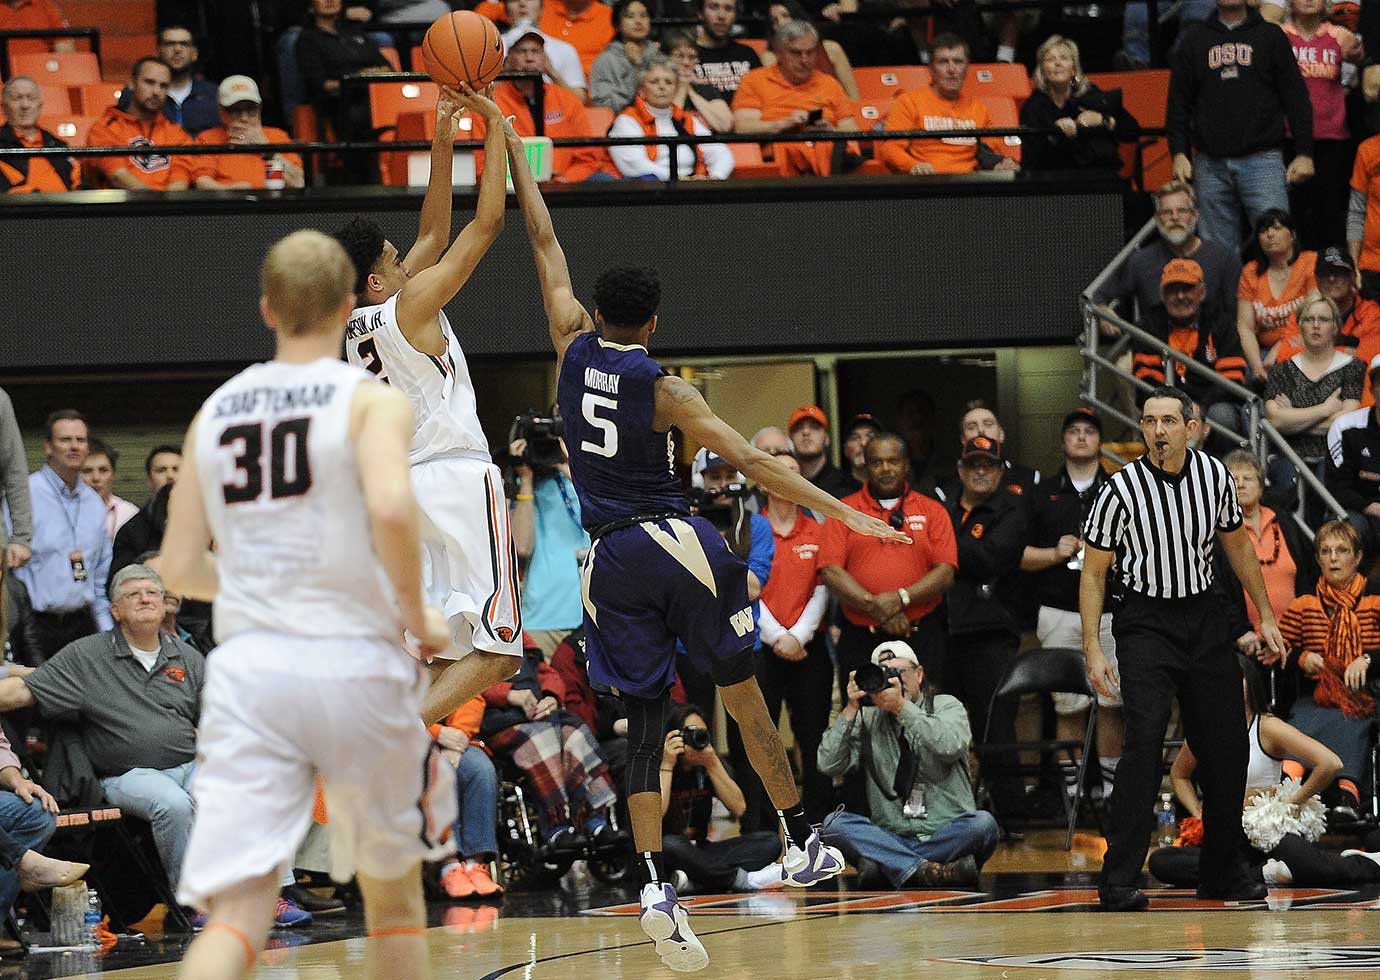 Oregon State freshman Stephen Thompson Jr. shoots the buzzer-beating three over Washington freshman Dejounte Murray.